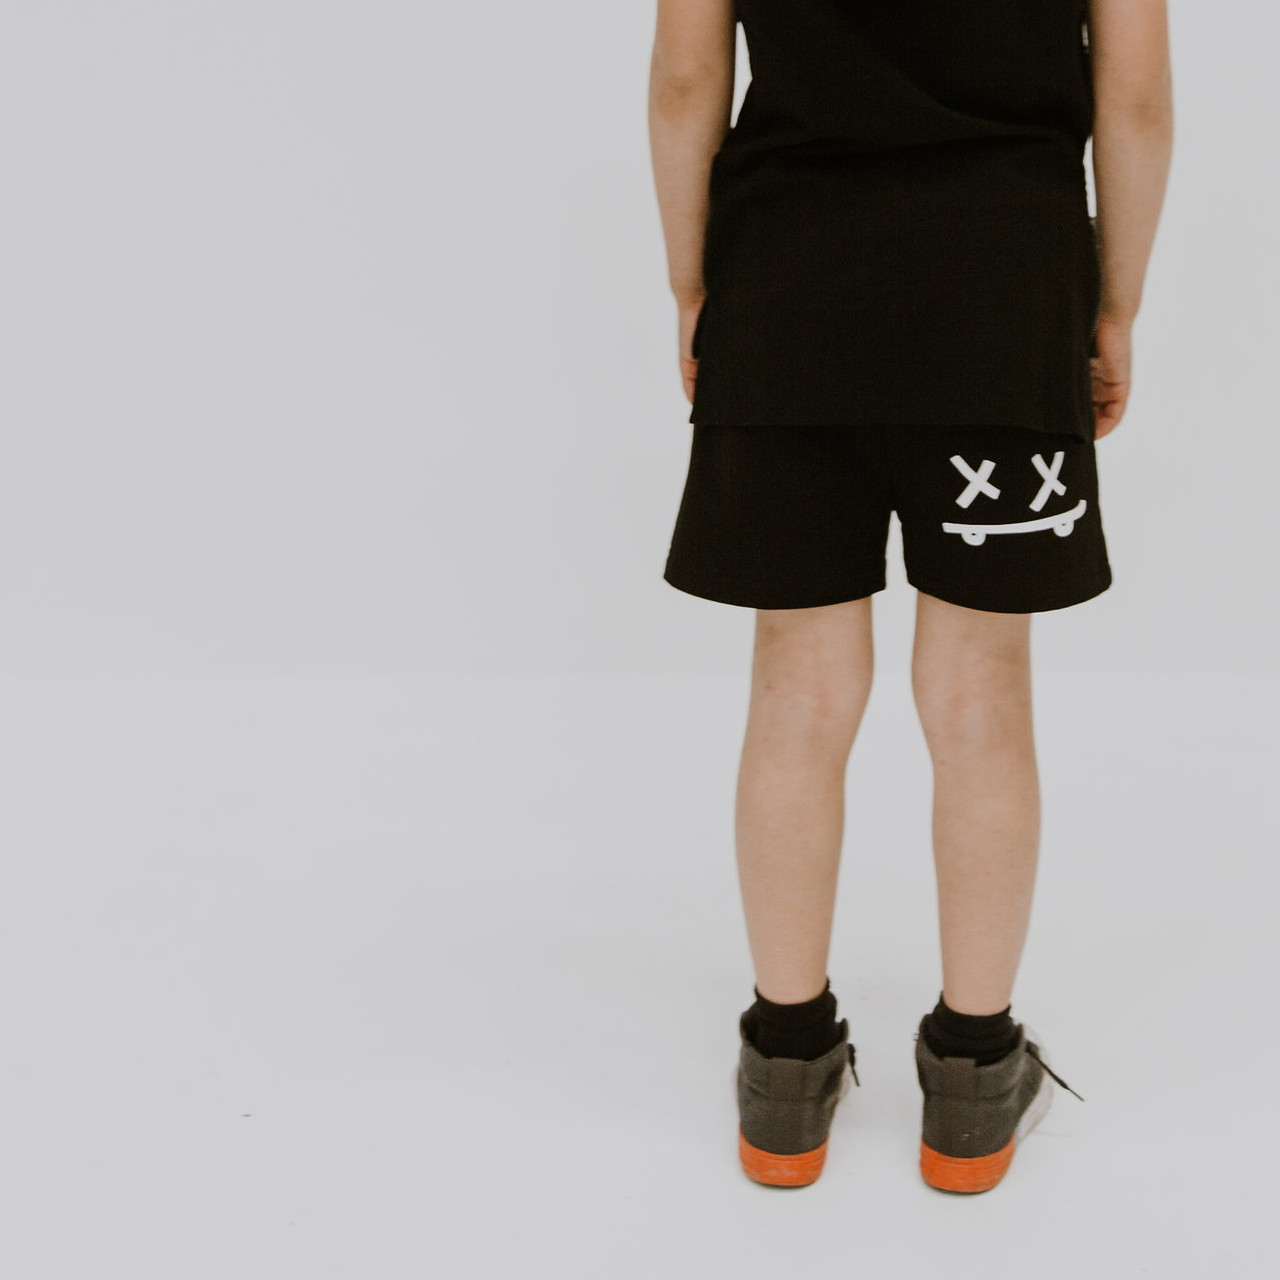 Skaterboy shorts by Punk Baby